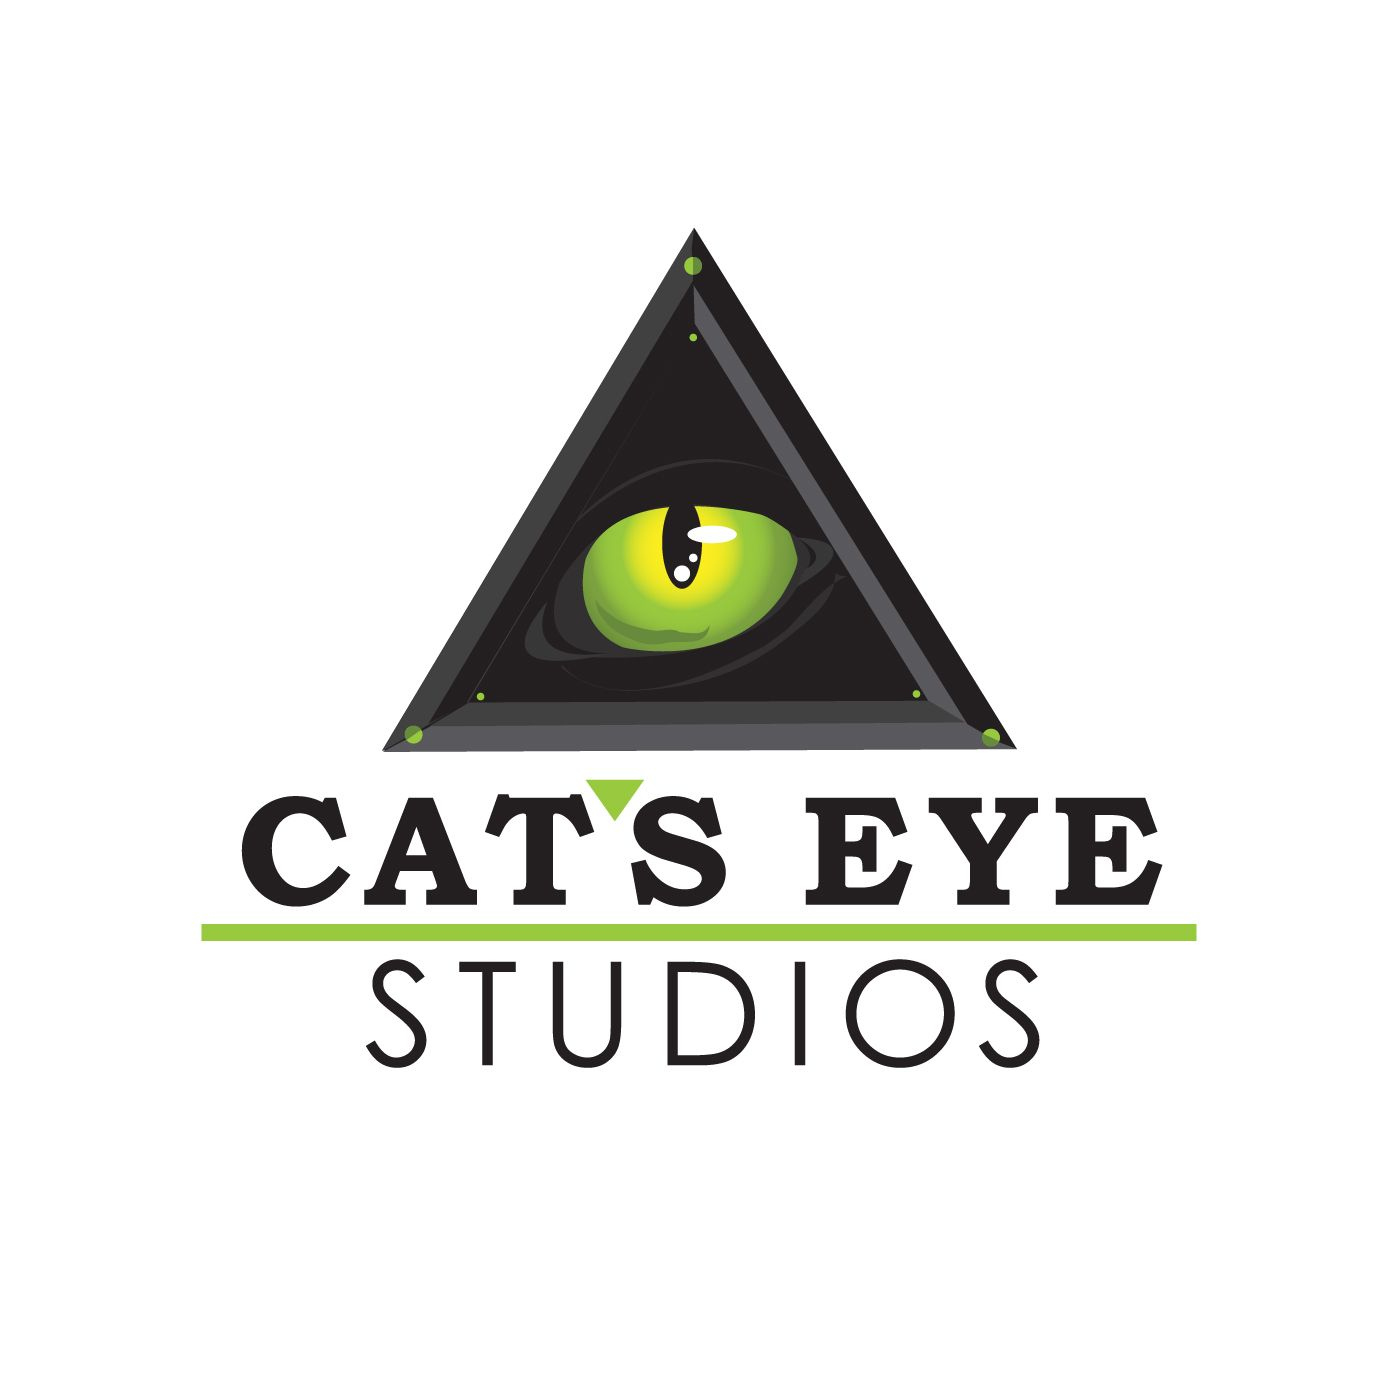 Cat's Eye Studios